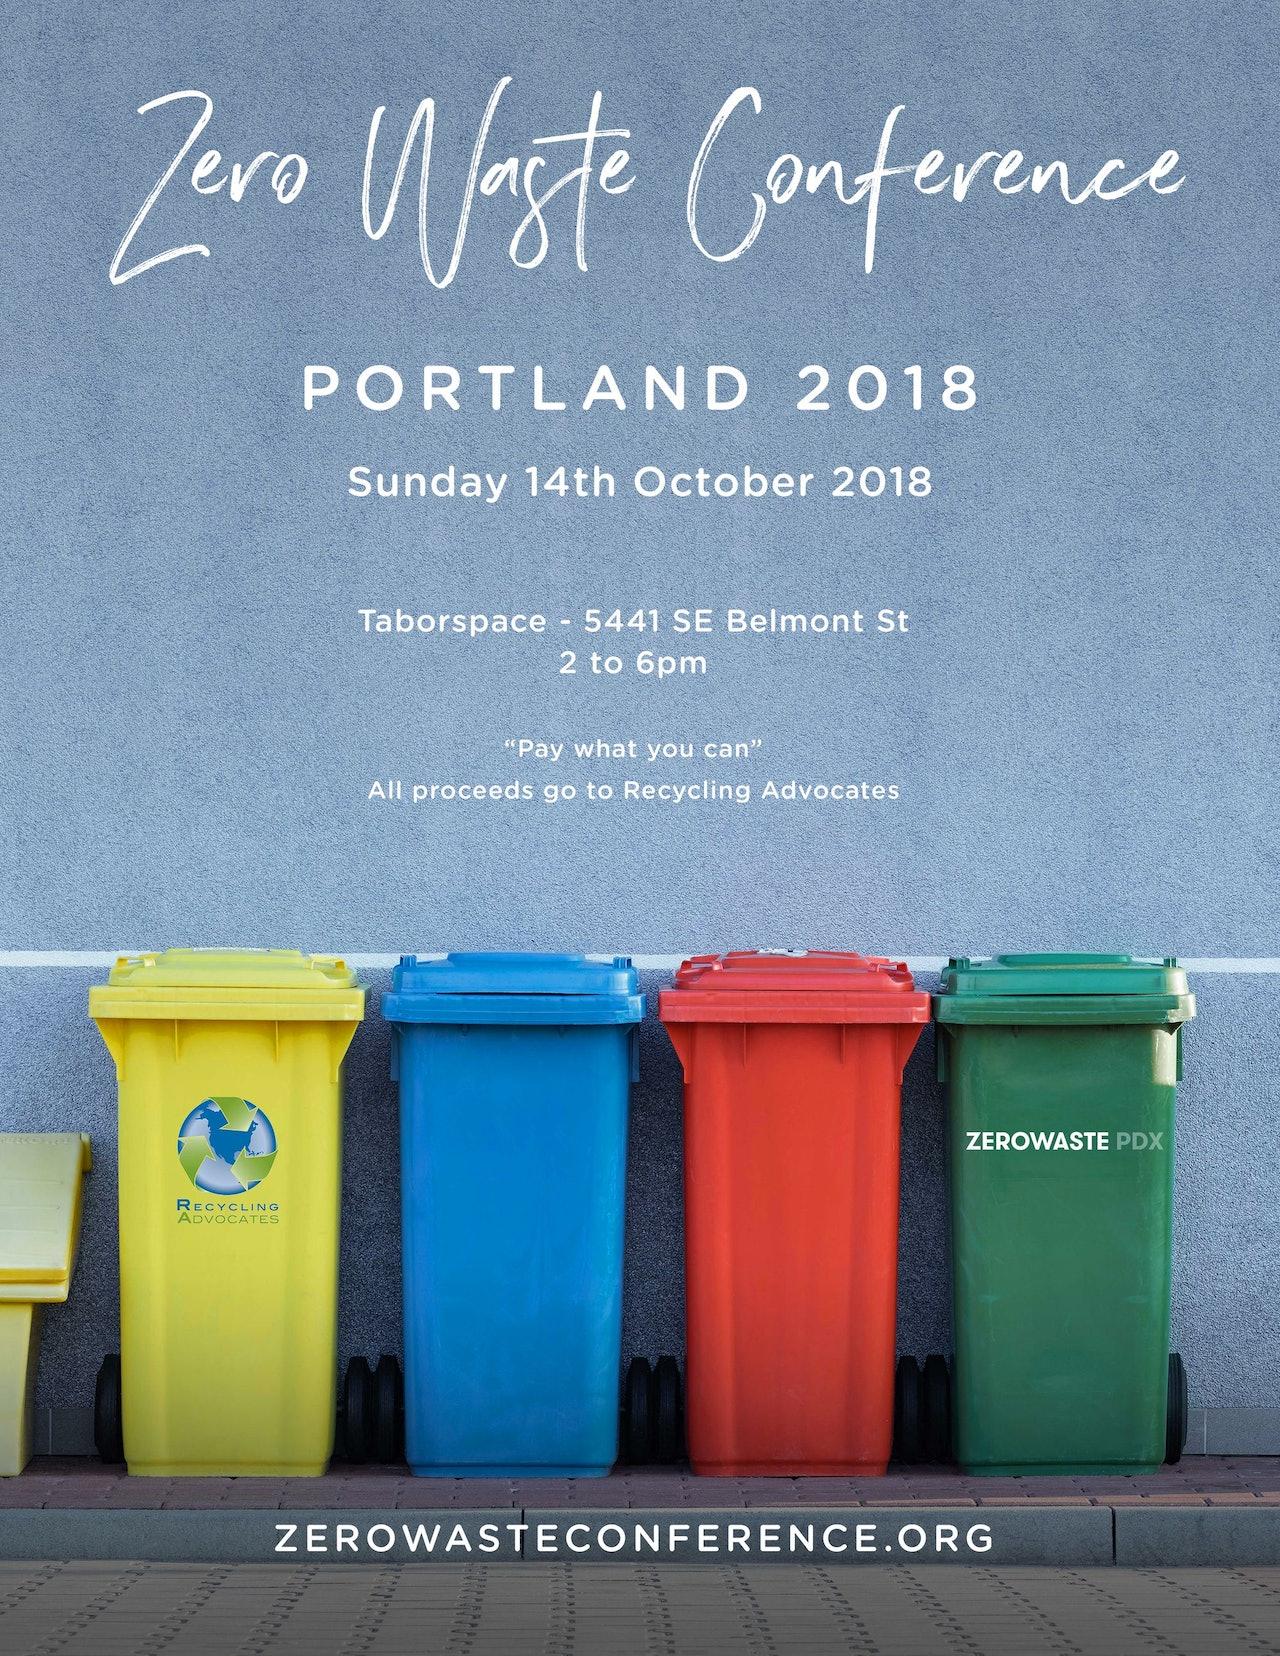 Portland Zero Waste Conference 2018